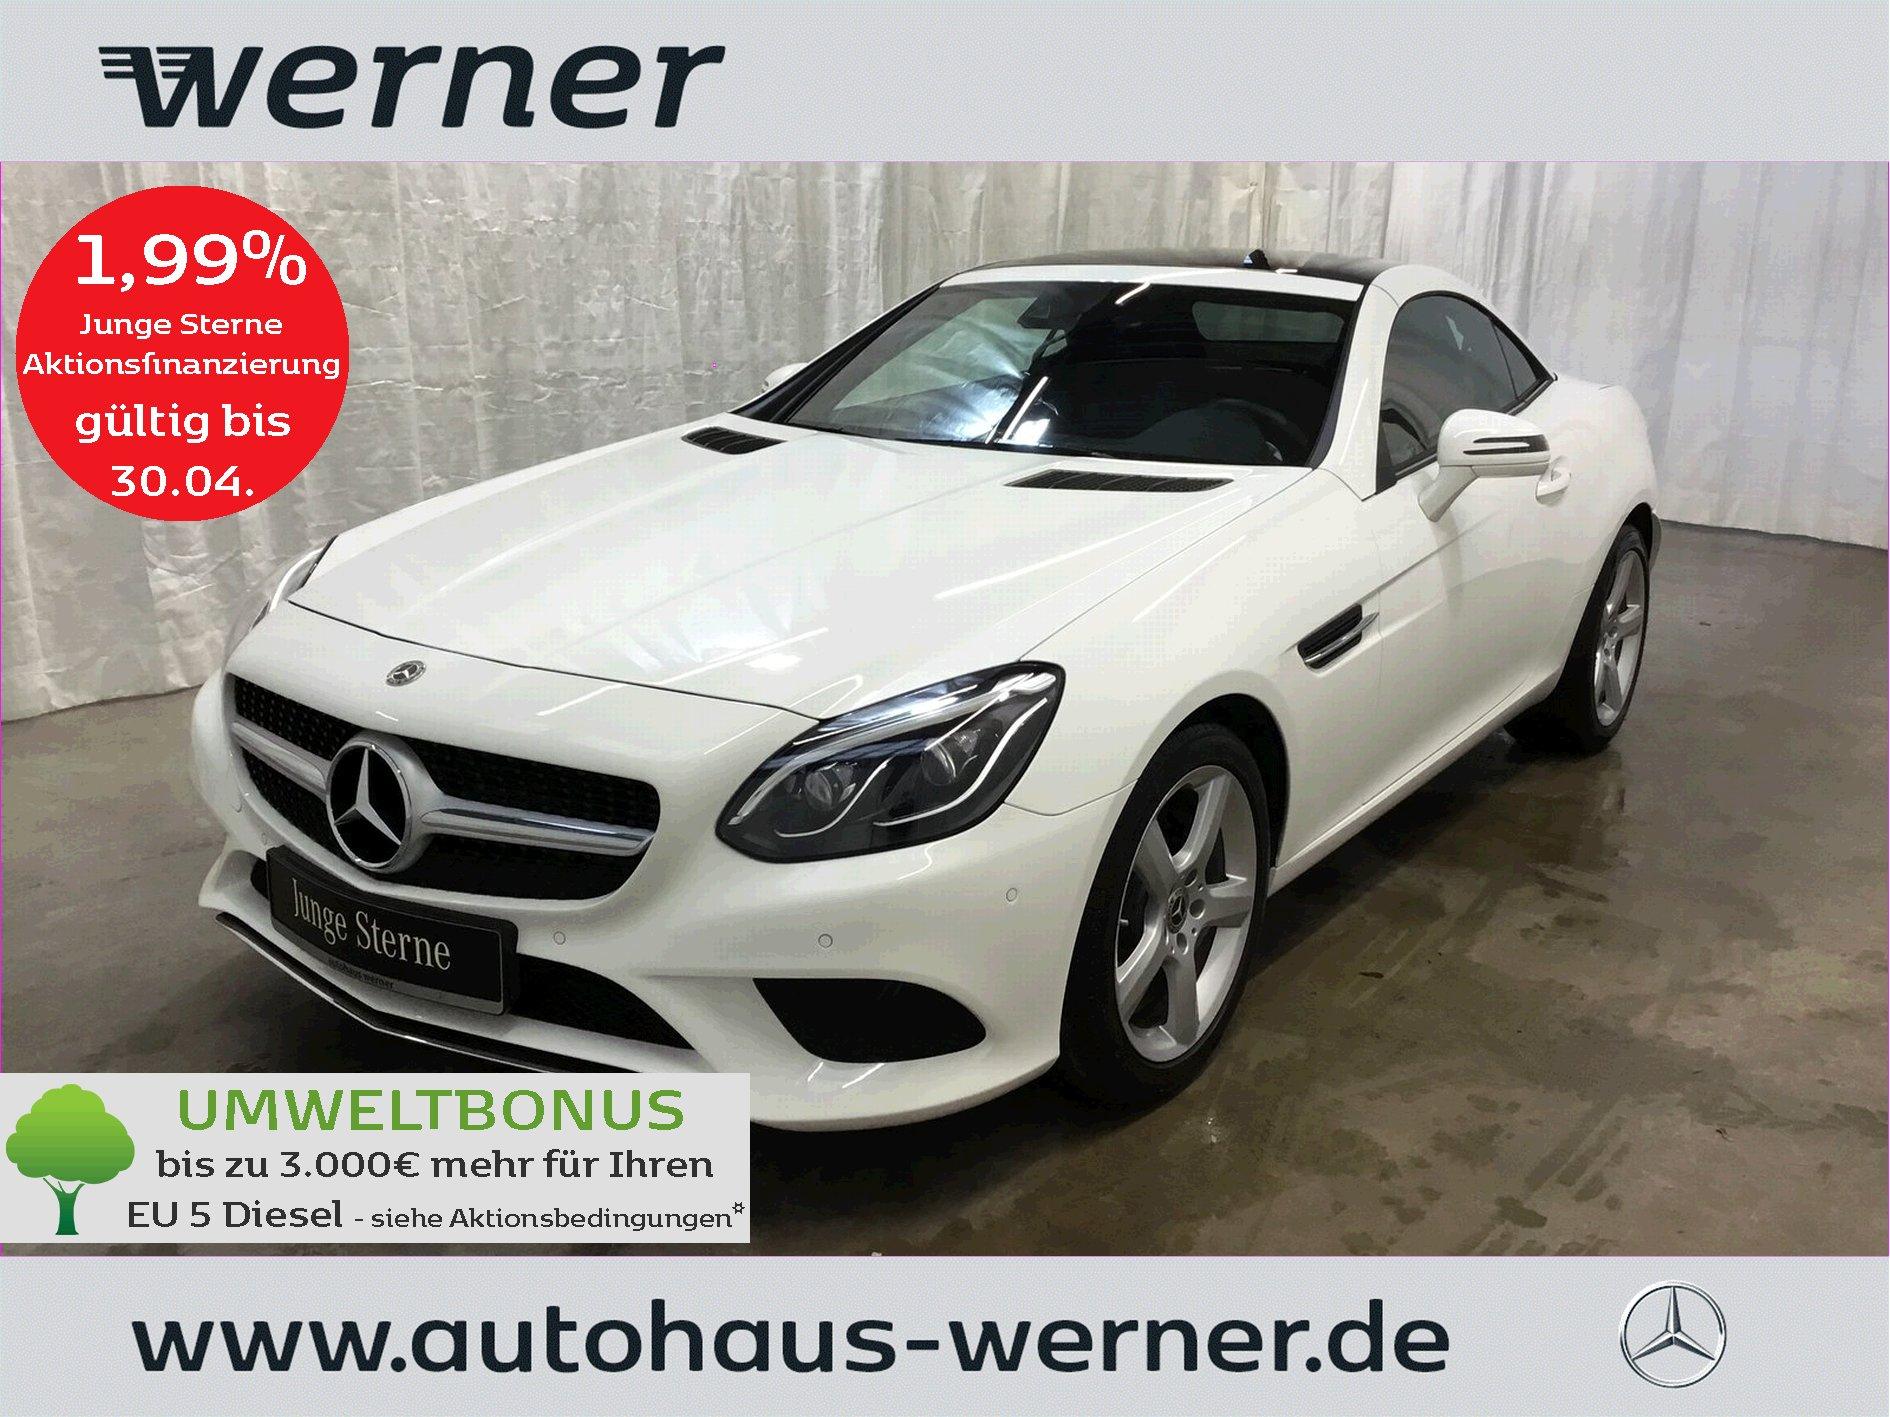 Mercedes-Benz SLC 200 ILS+LED+Totwinkel+AIRSCARF+Park+SHZ+AFA+, Jahr 2020, Benzin